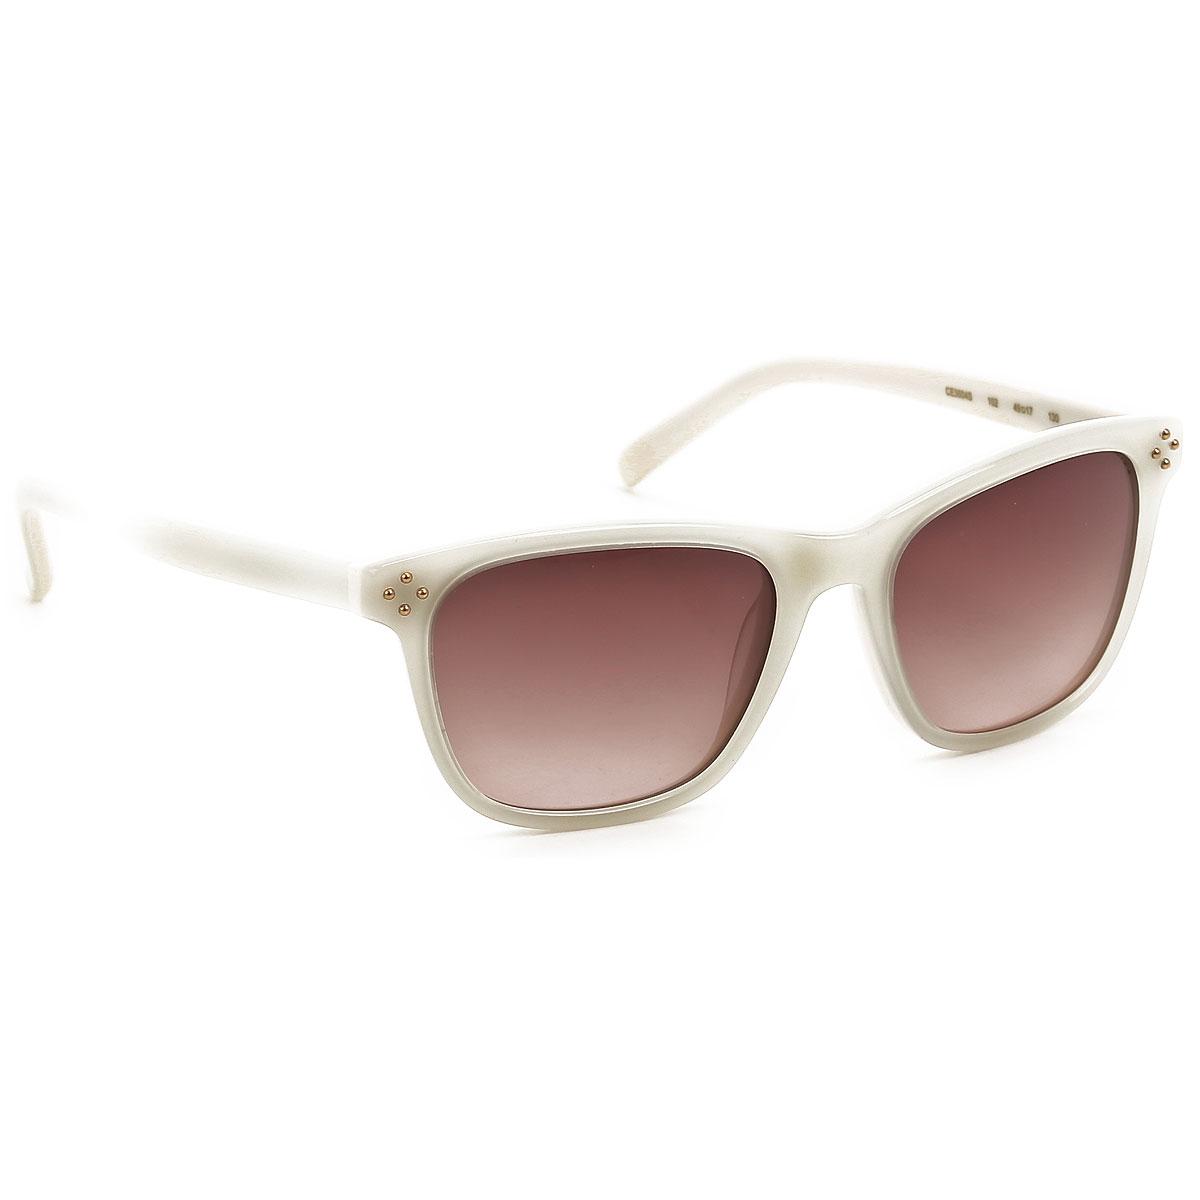 Image of Chloe Kids Sunglasses for Girls On Sale, Ivory, 2017